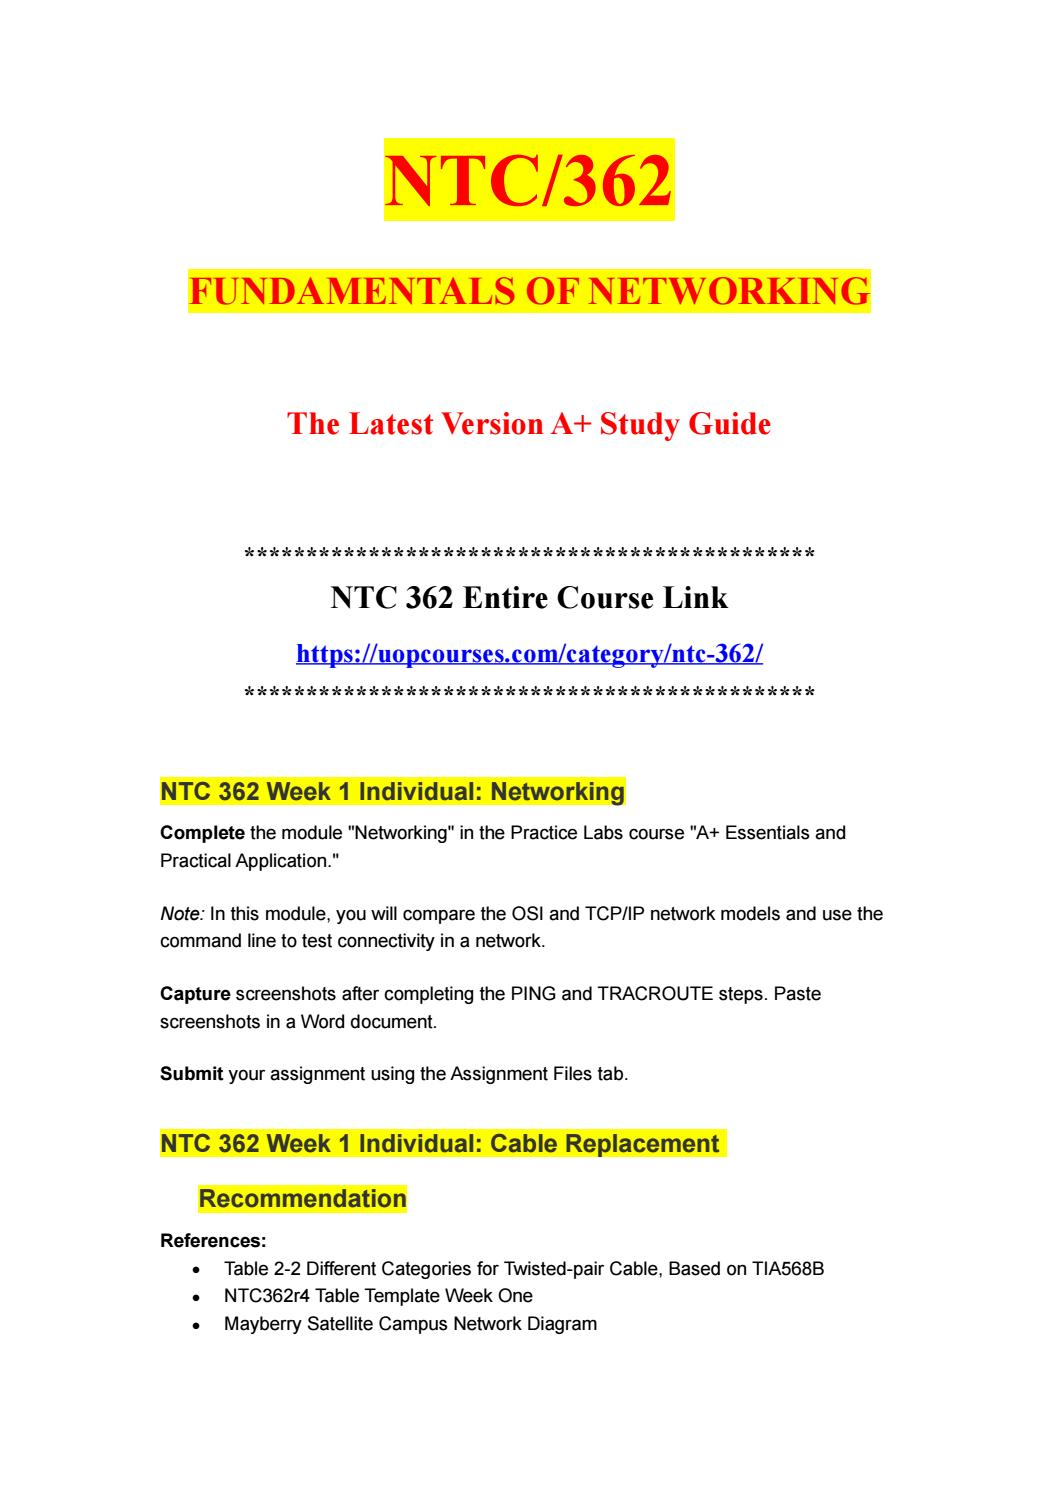 NTC/362 FUNDAMENTALS OF NETWORKING//https://uopcourses com